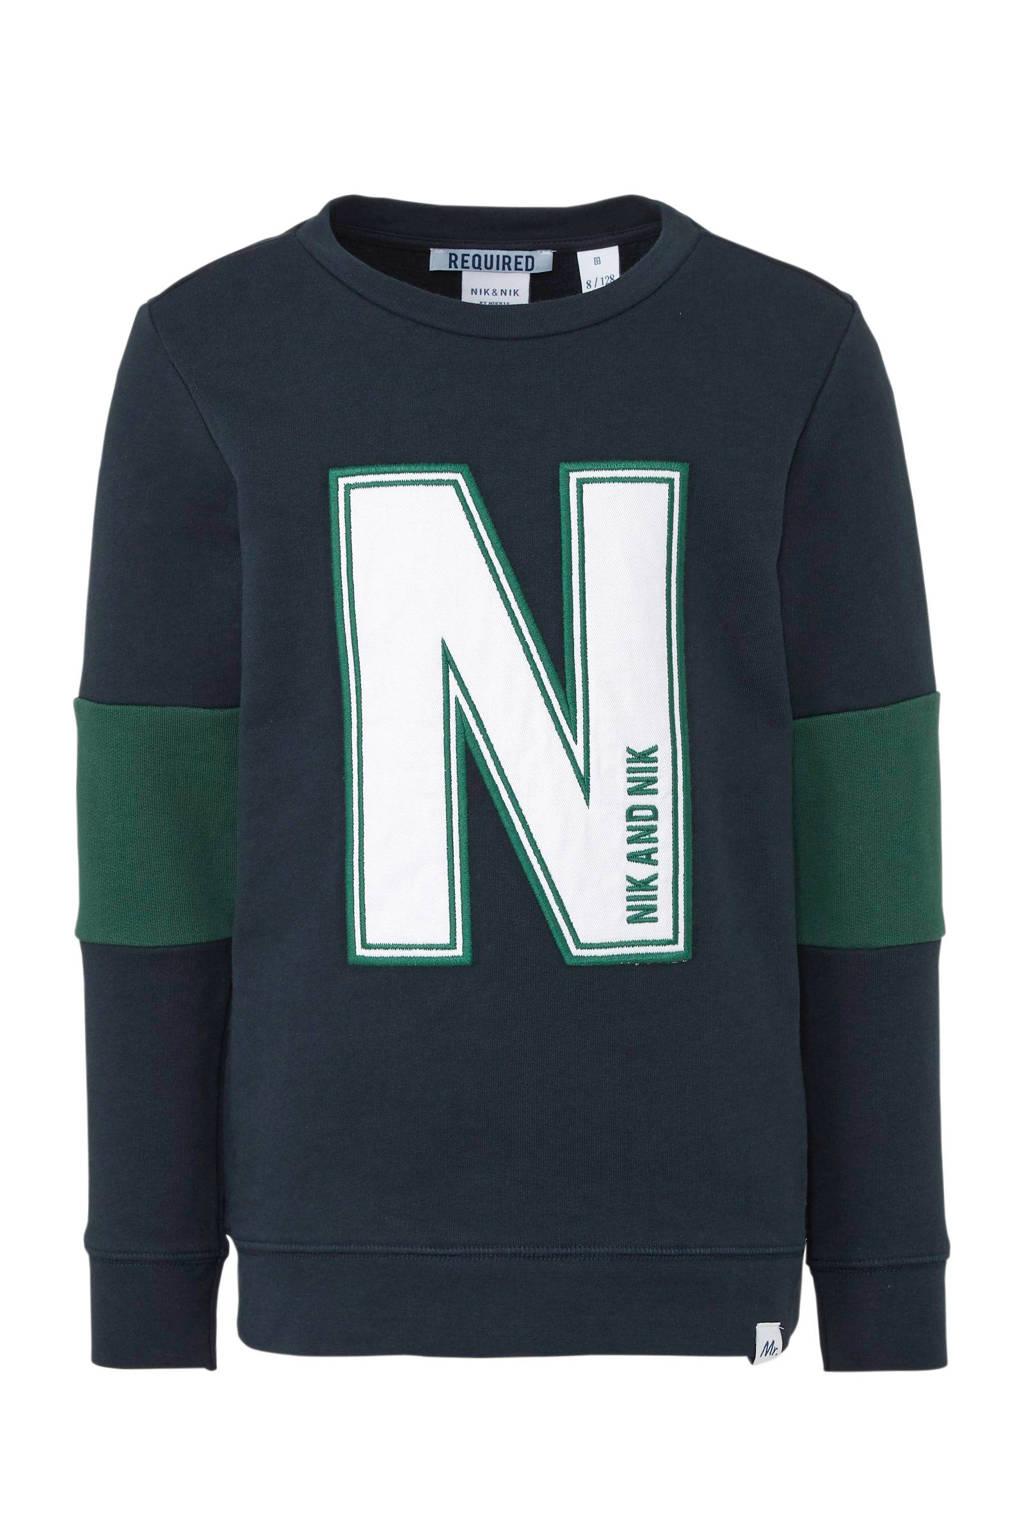 NIK&NIK sweater Pasquallo met printopdruk donkerblauw/groen, Donkerblauw/groen